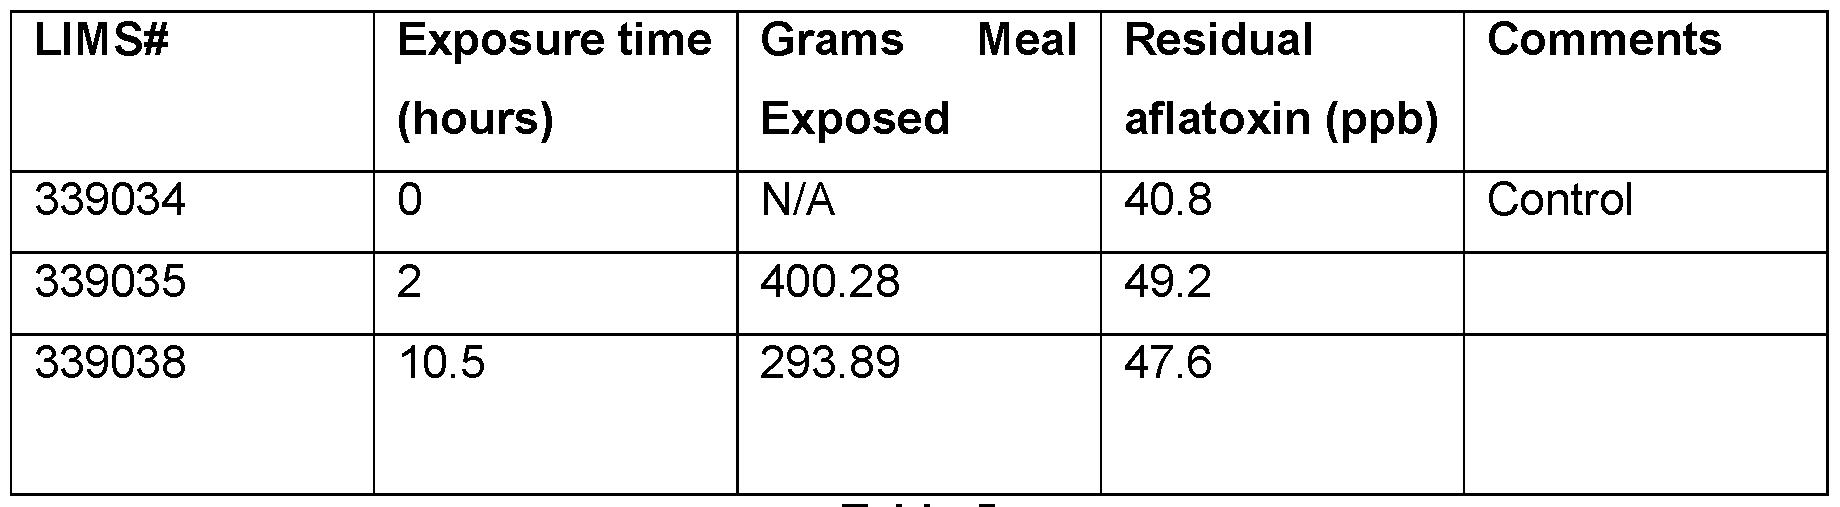 WO2015004448A1 - Treatment of liquid gluten slurry to reduce